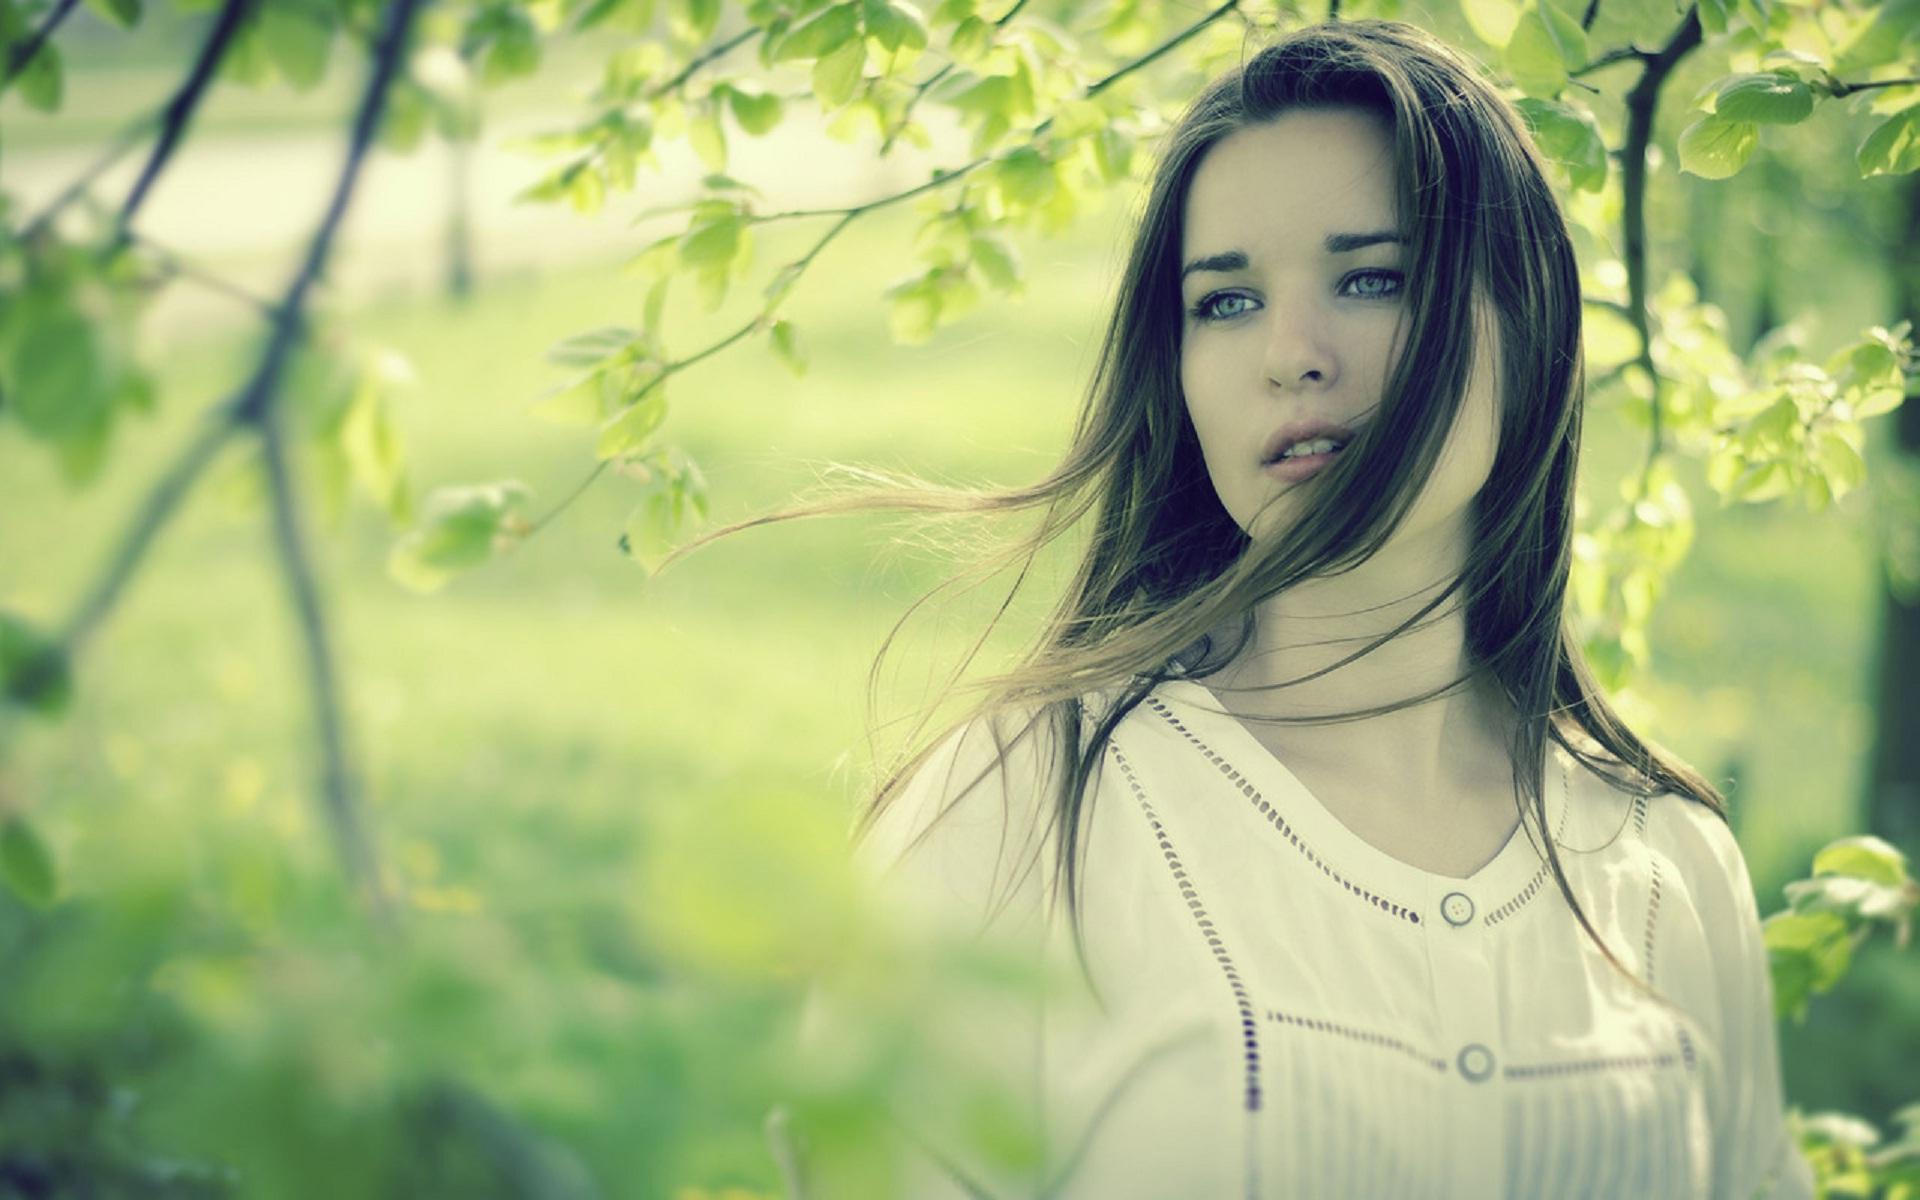 New Sad Girl Hd Widescreen Wallpapers - Beautiful Girl Hd Sad , HD Wallpaper & Backgrounds